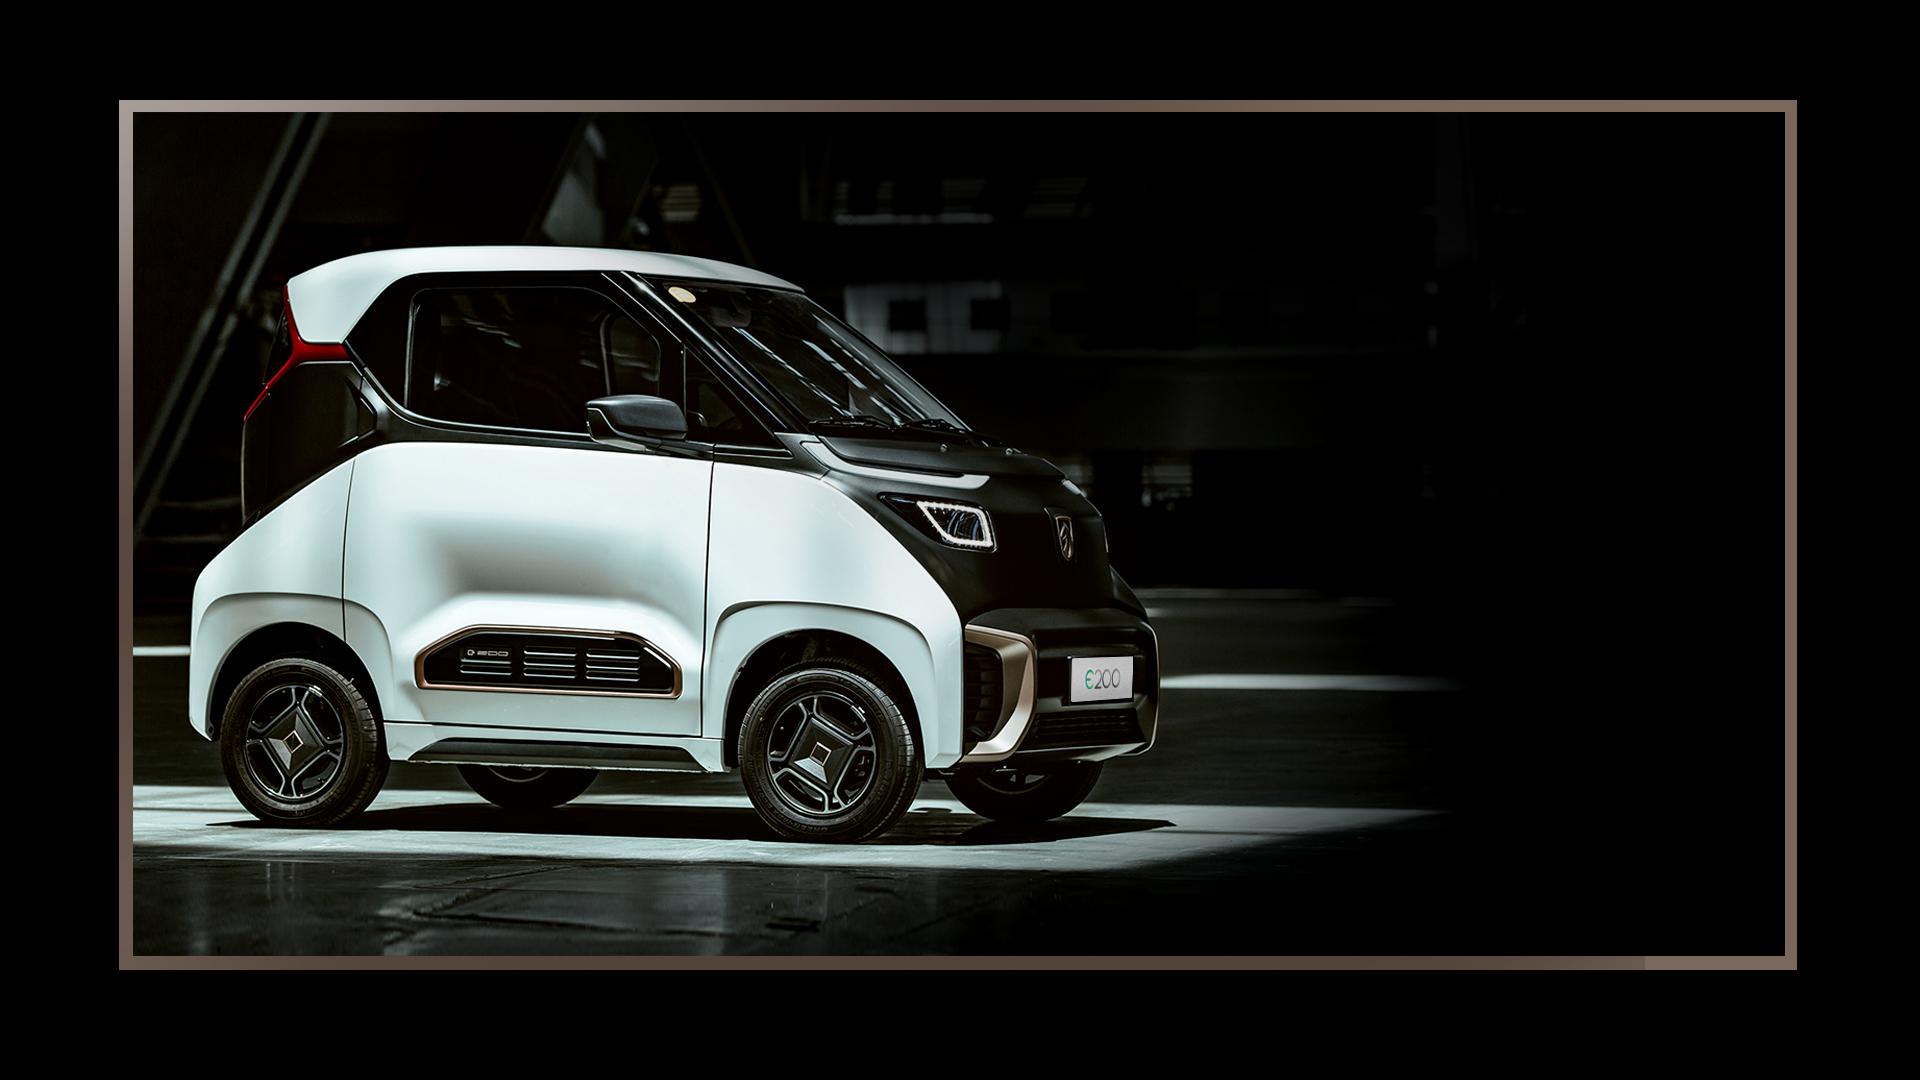 寶駿E200,電(dian)動汽(qi)車,新(xin)能源(yuan)車,外觀,顏色,圖片